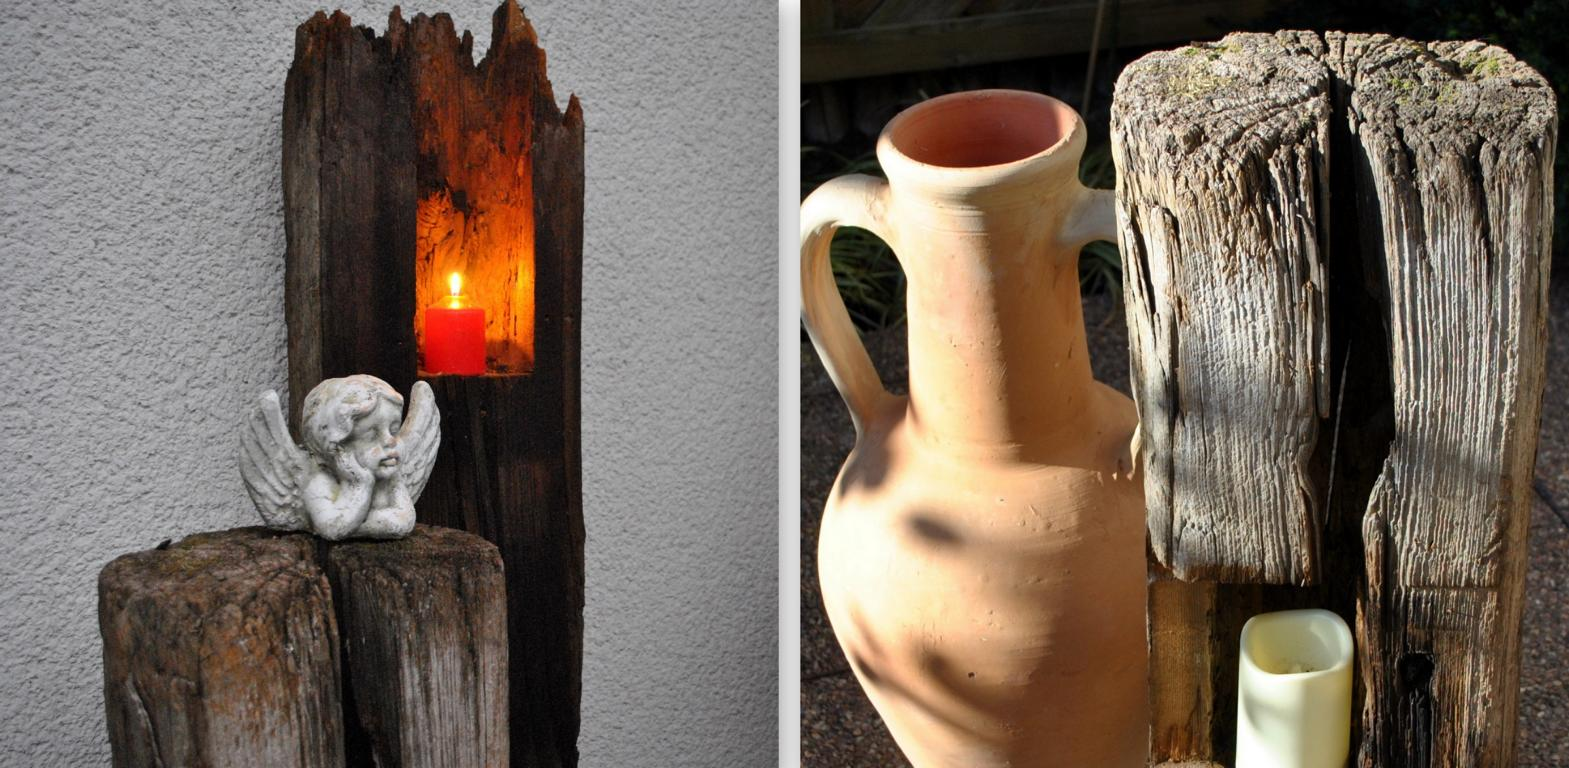 Gartendeko Blog Alter Pfosten als dekoratives Schmuckstück